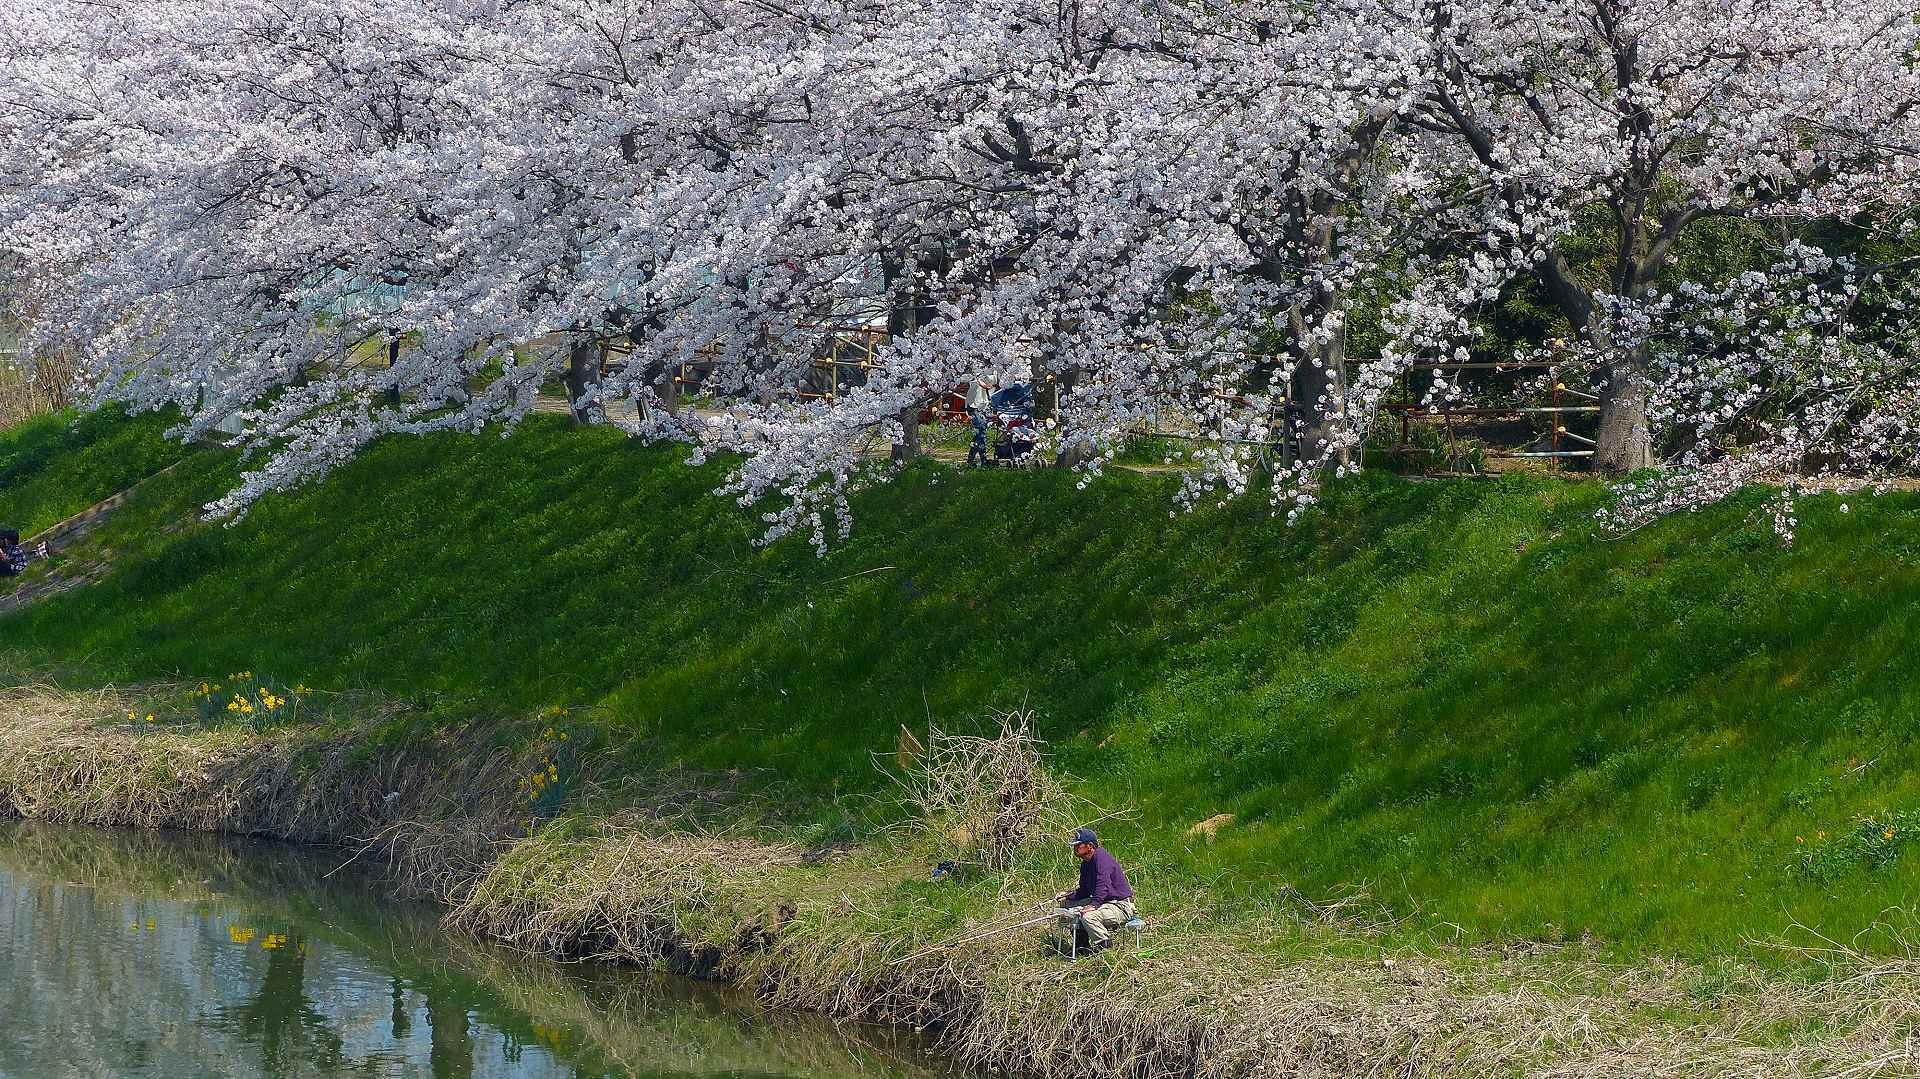 満開の桜を堪能! 【 2018 3/28(水) 】_a0185081_19300503.jpg